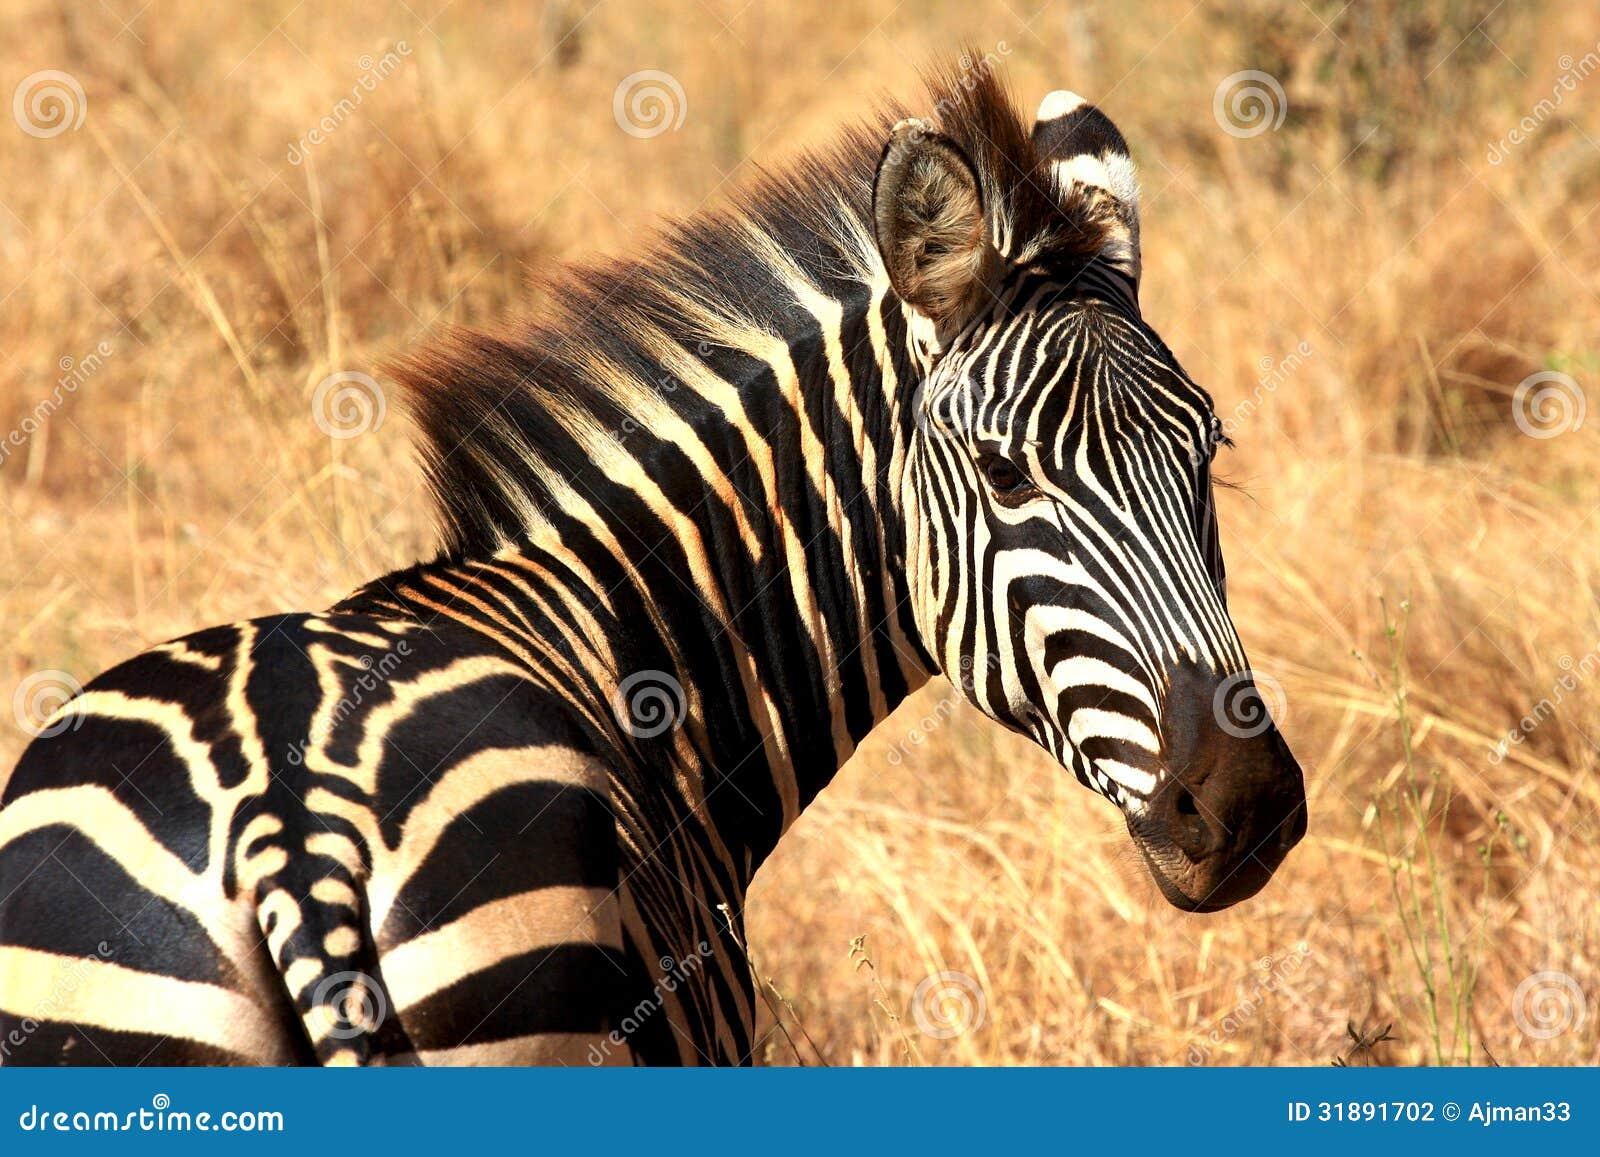 zebra look stock photography image 31891702. Black Bedroom Furniture Sets. Home Design Ideas